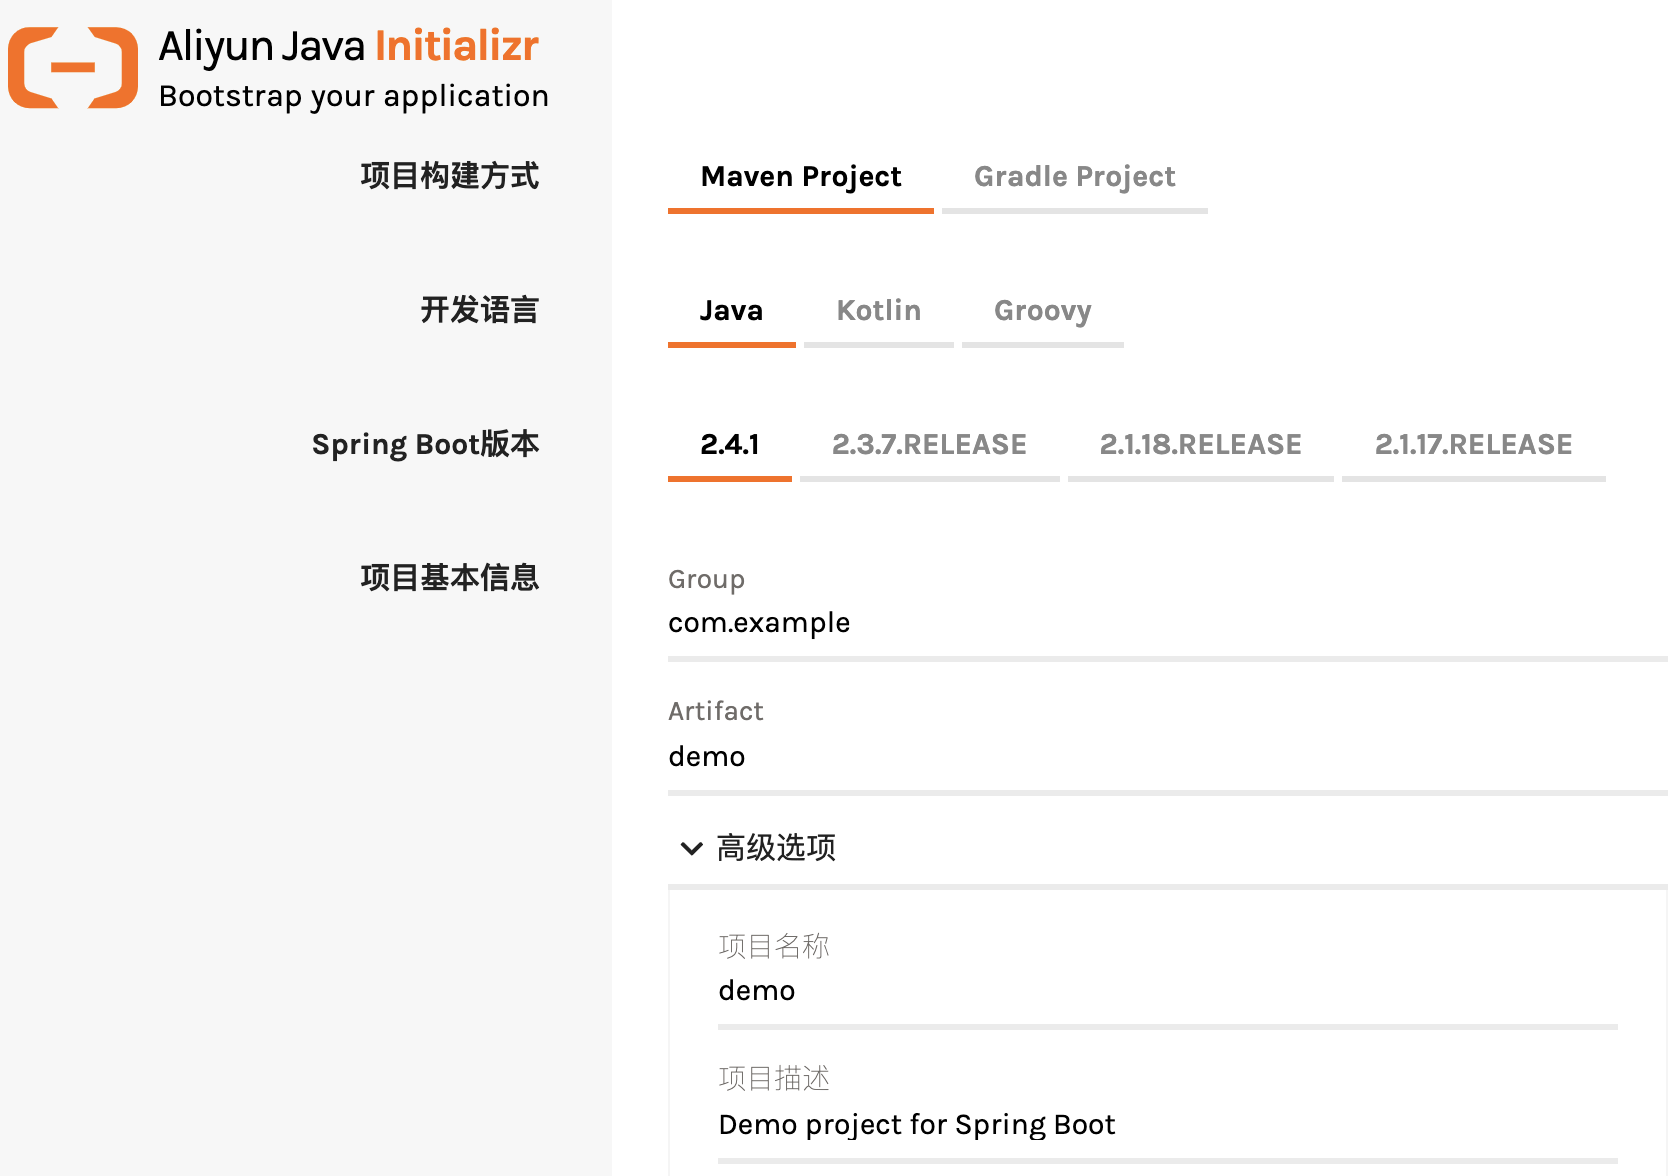 Aliyun Java Initializr